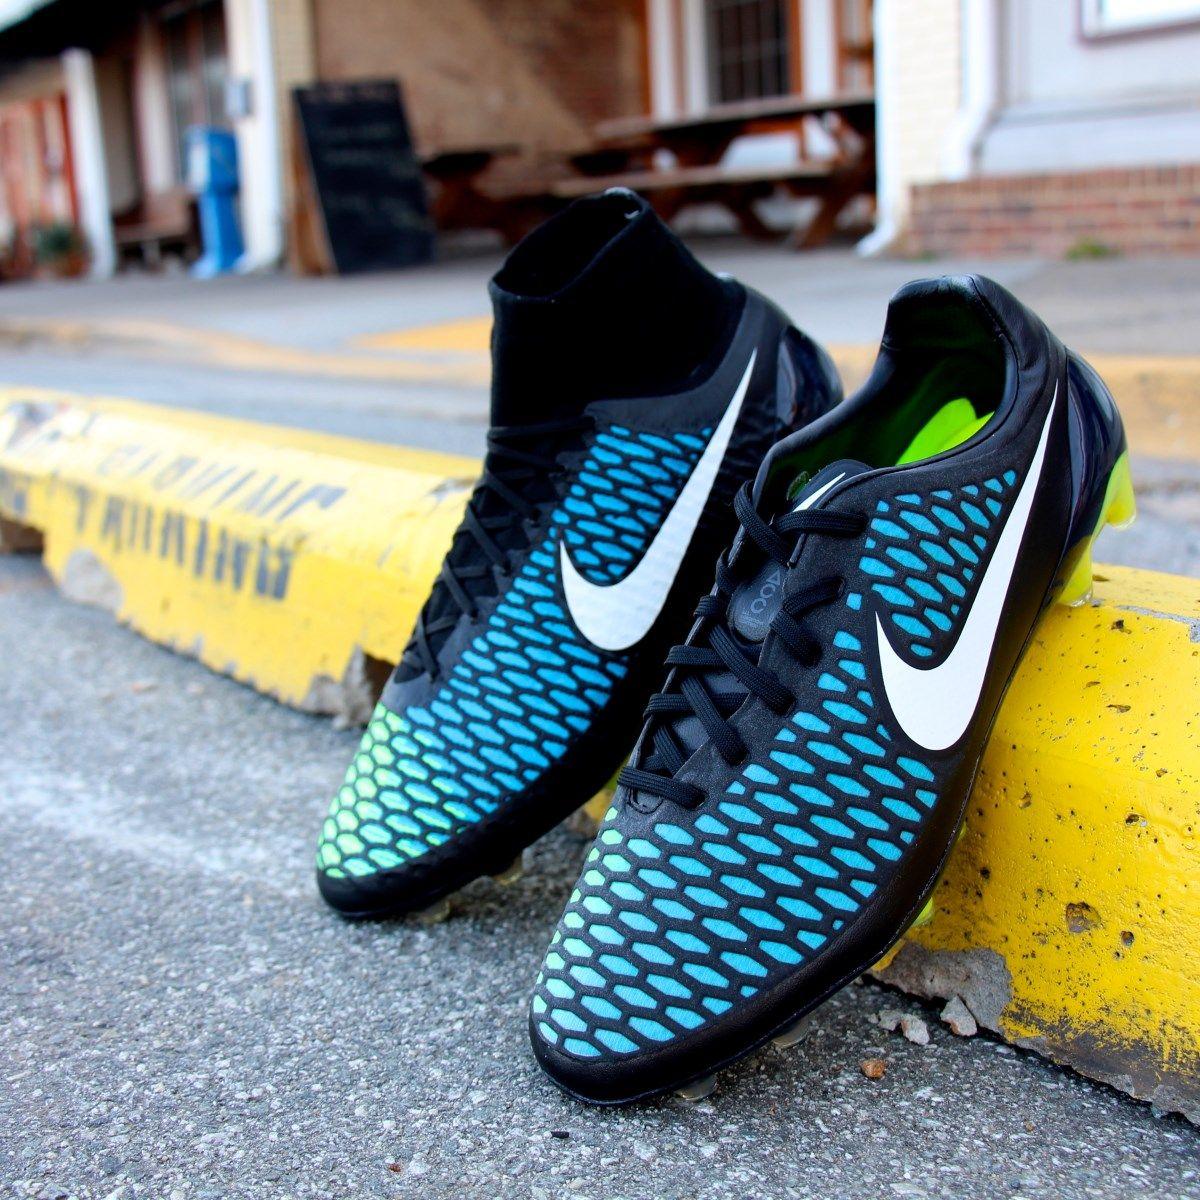 COM | Soccer Cleats and Shoes, Soccer Jerseys, Soccer Balls, Goalkeeping,  Shin guards, Socks